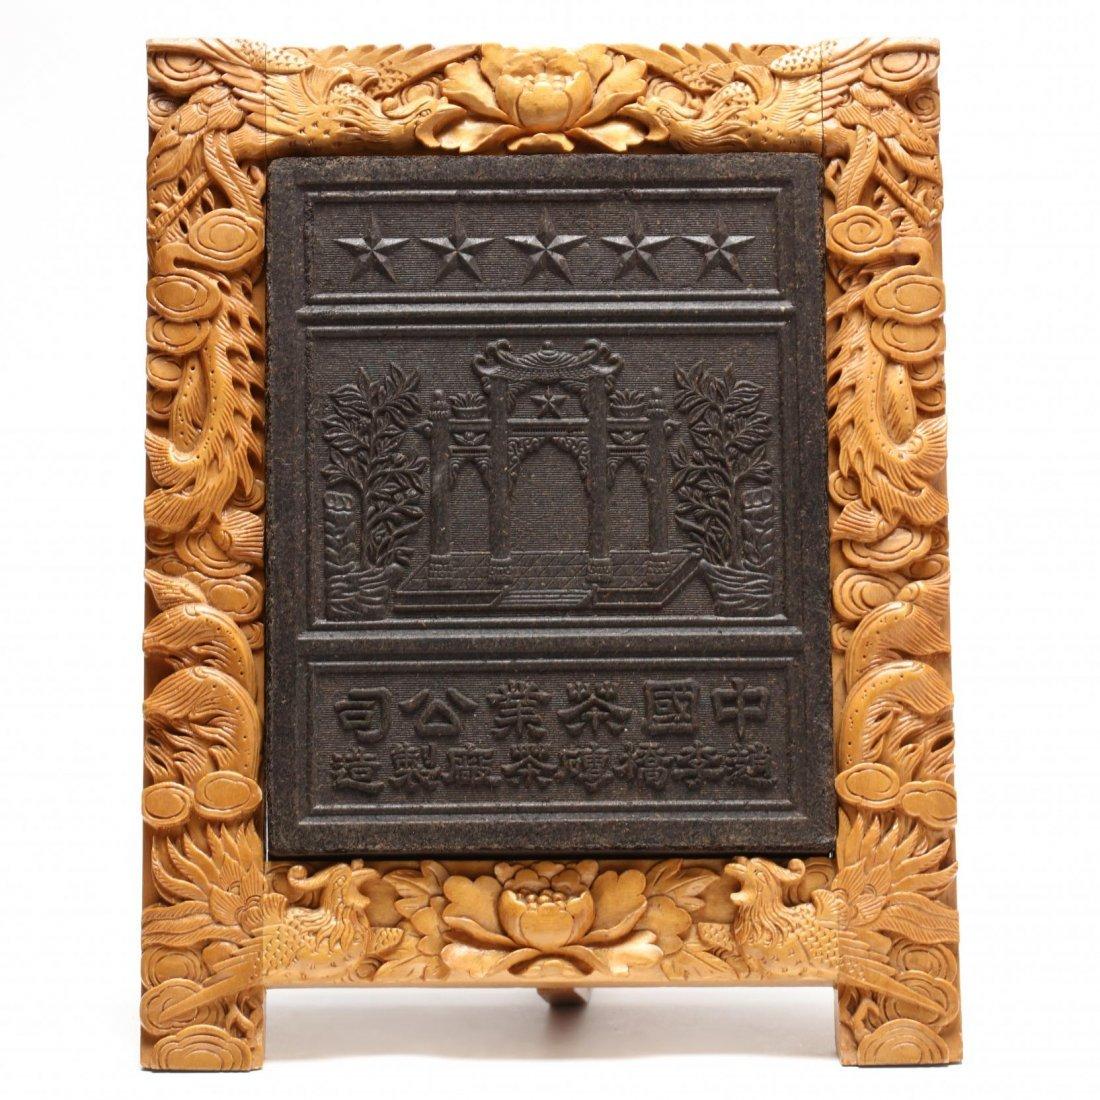 Chinese Framed Hubei (Black Tea) Brick